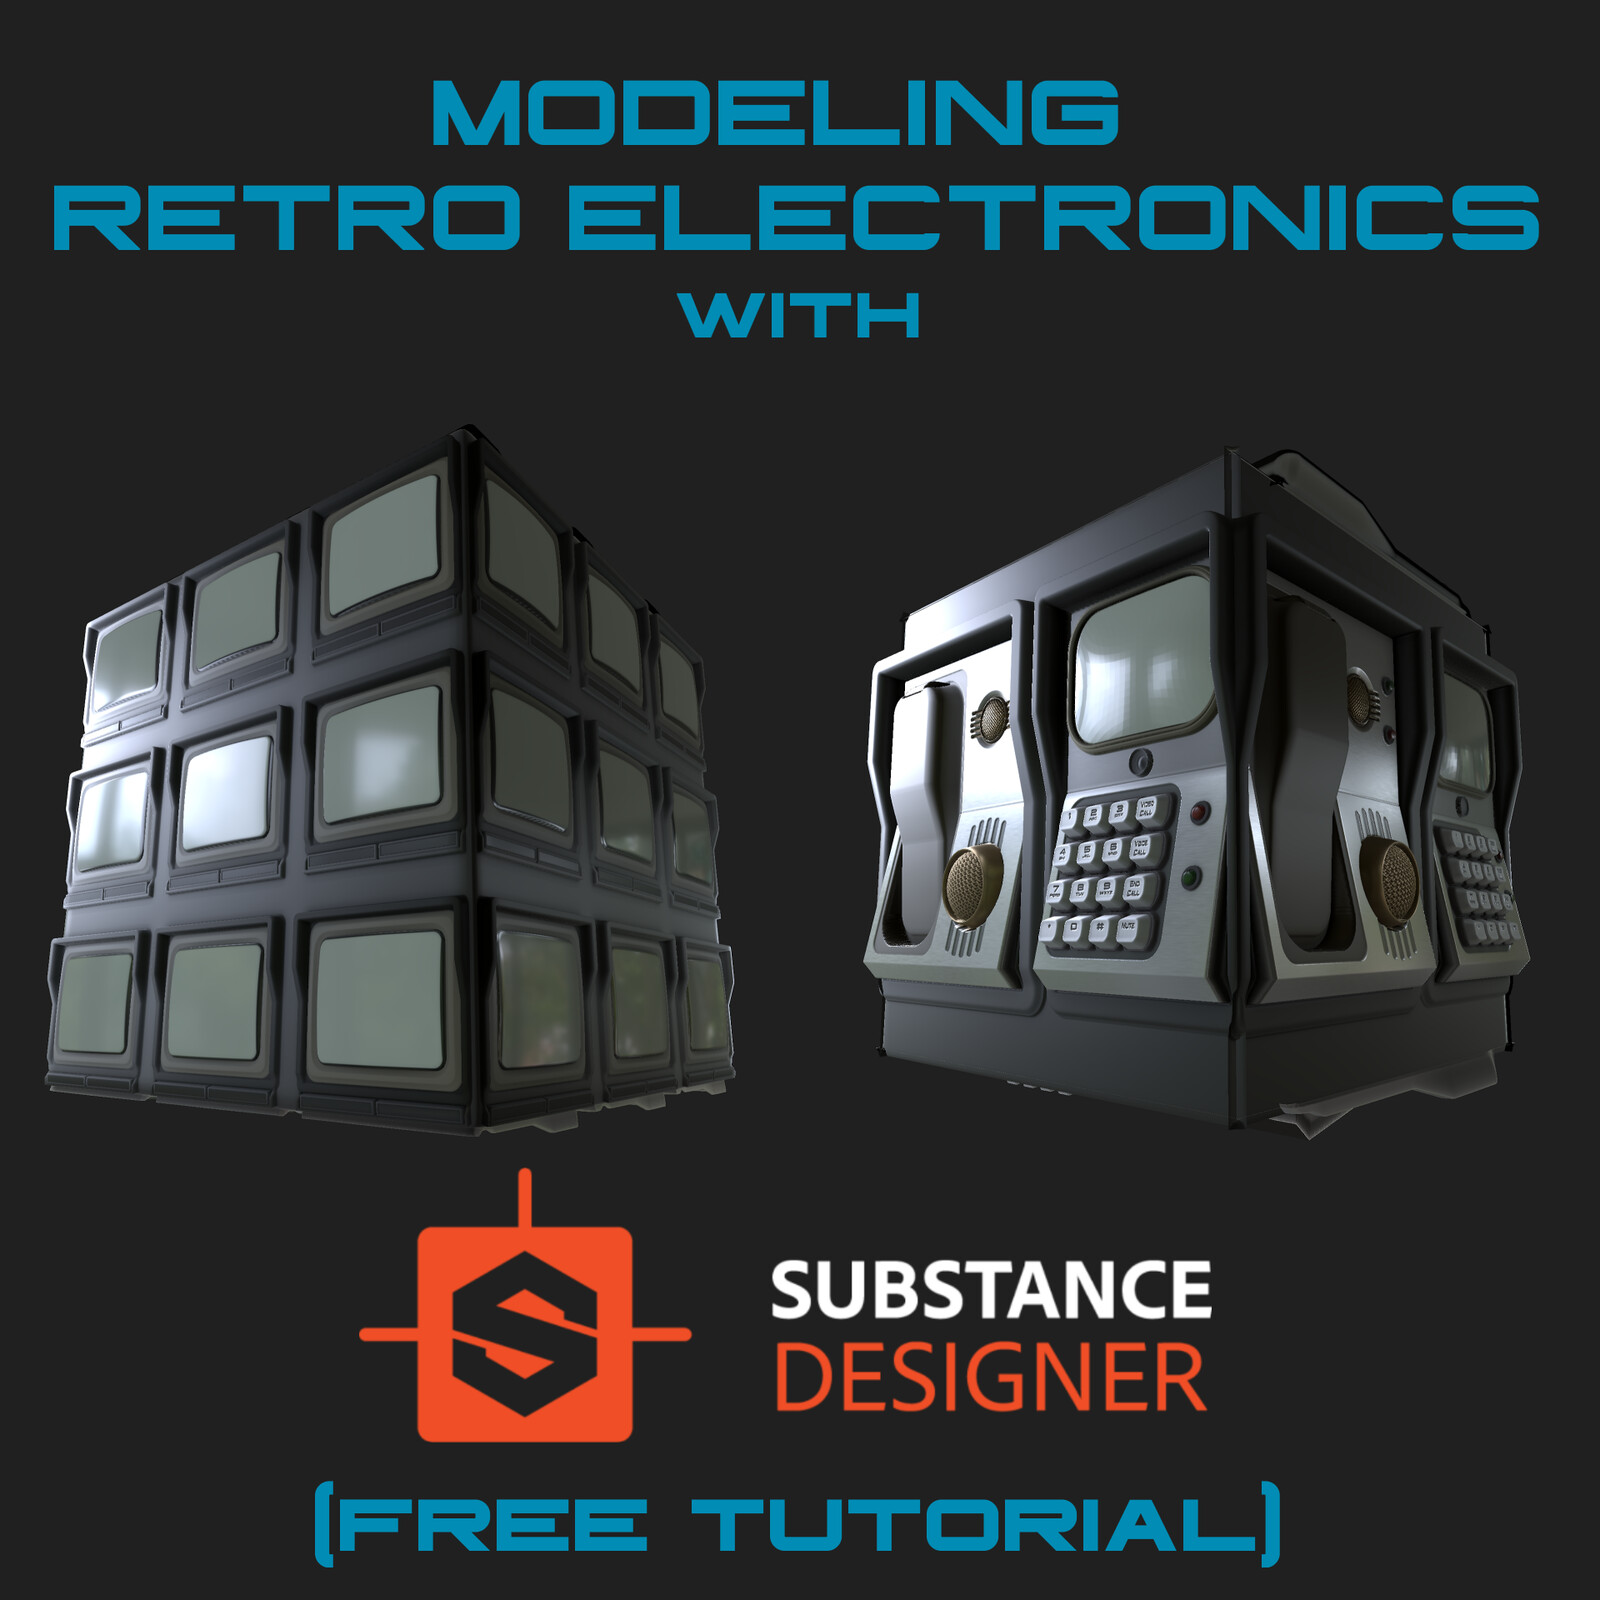 Substance Designer Tutorial - Modeling Retro Electronics